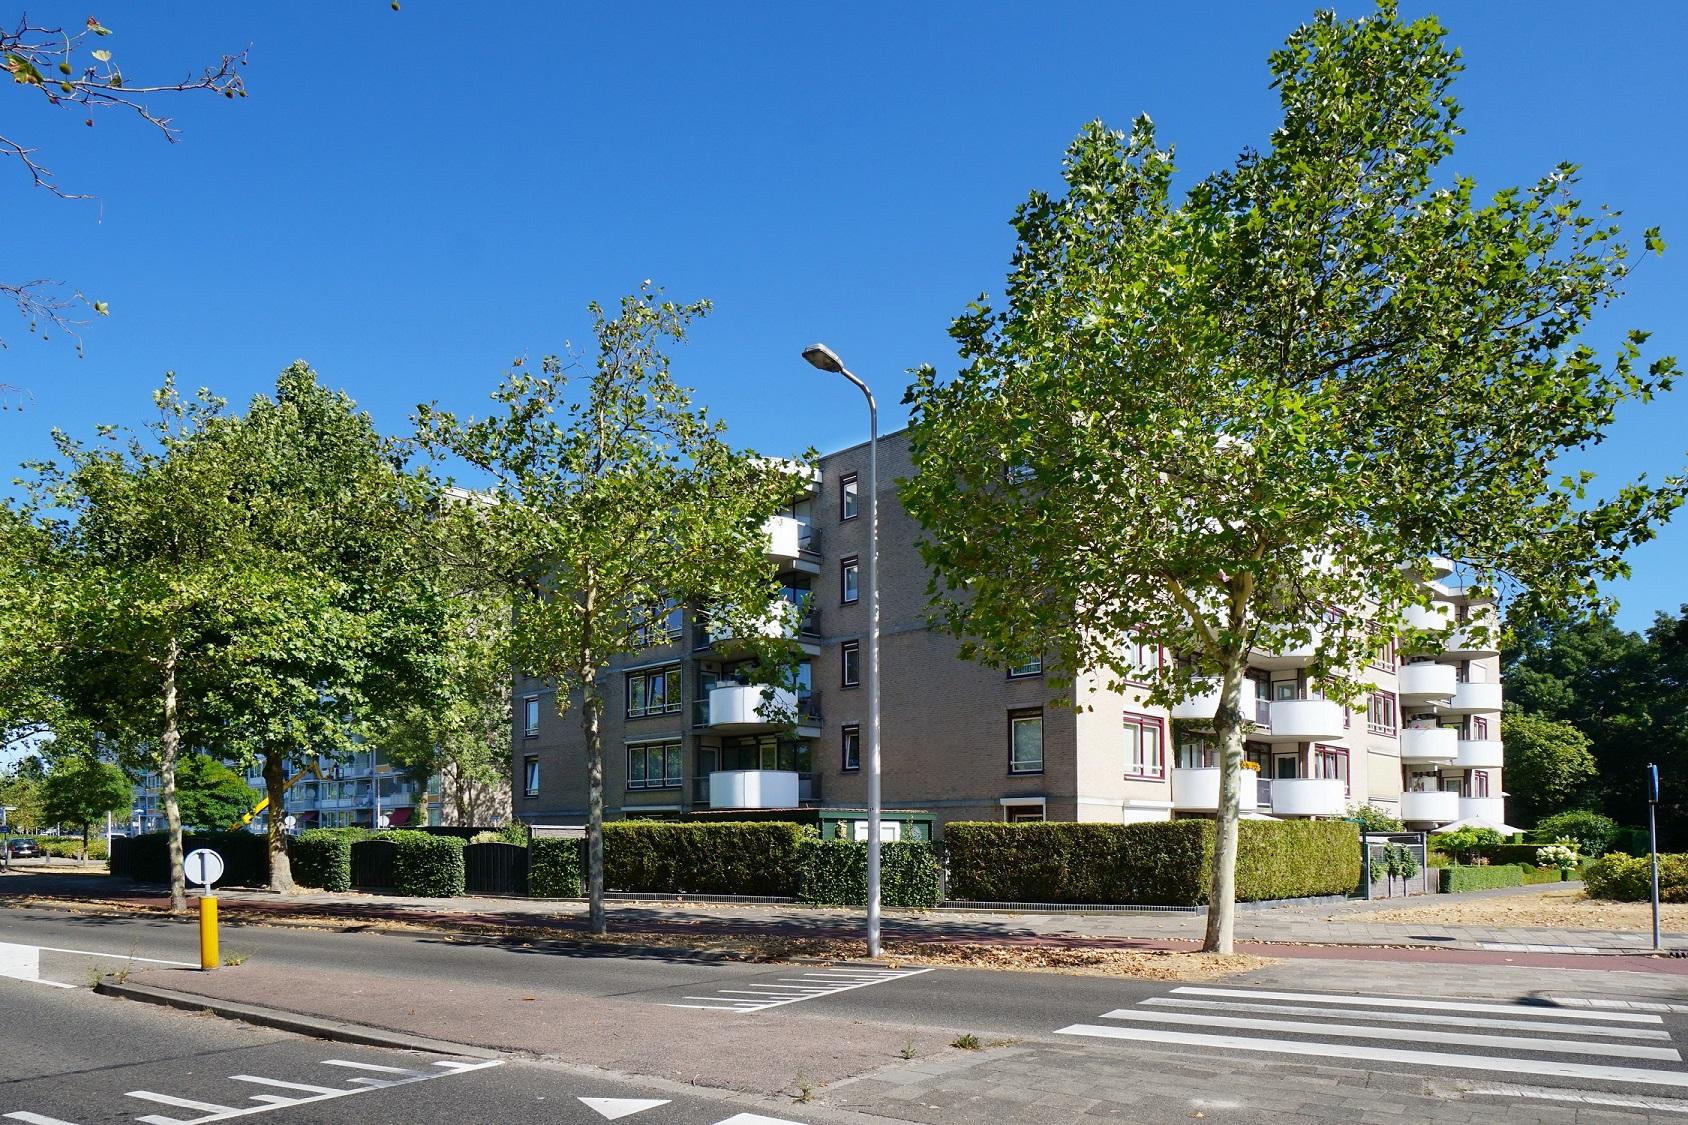 St.-Eustatiusdreef 310, 3564 GG Utrecht